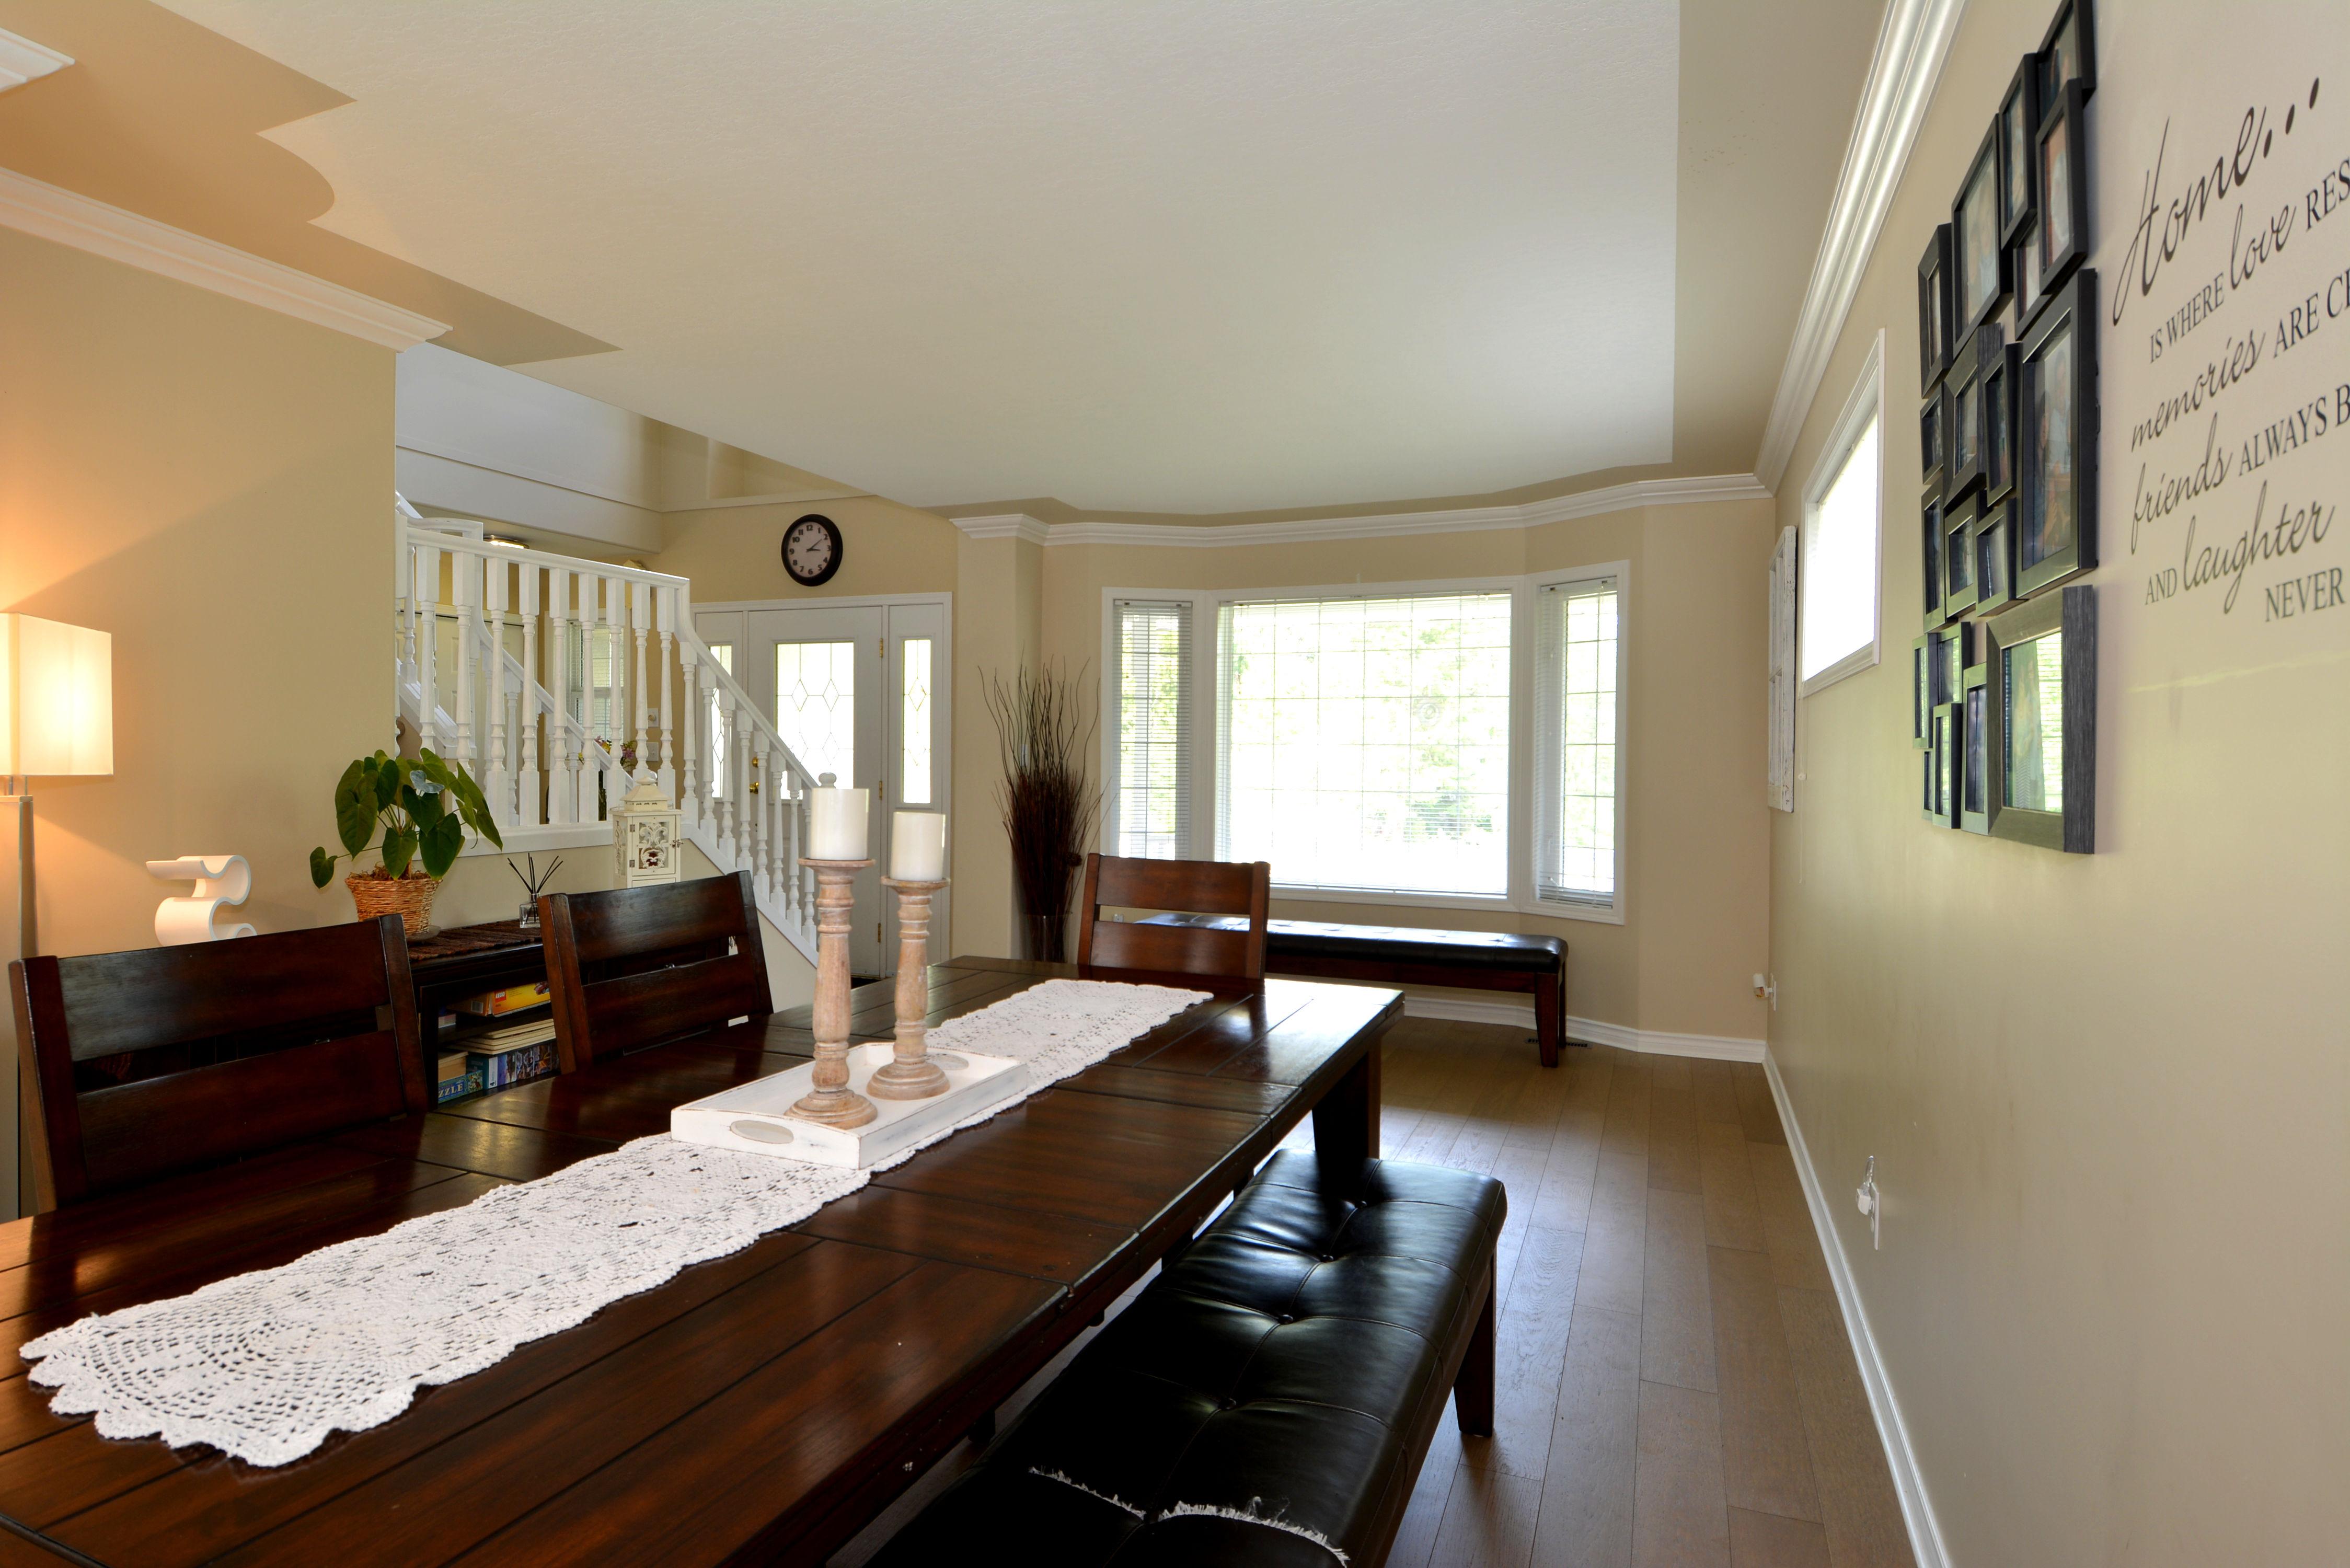 Dining Room:  10' x 12'